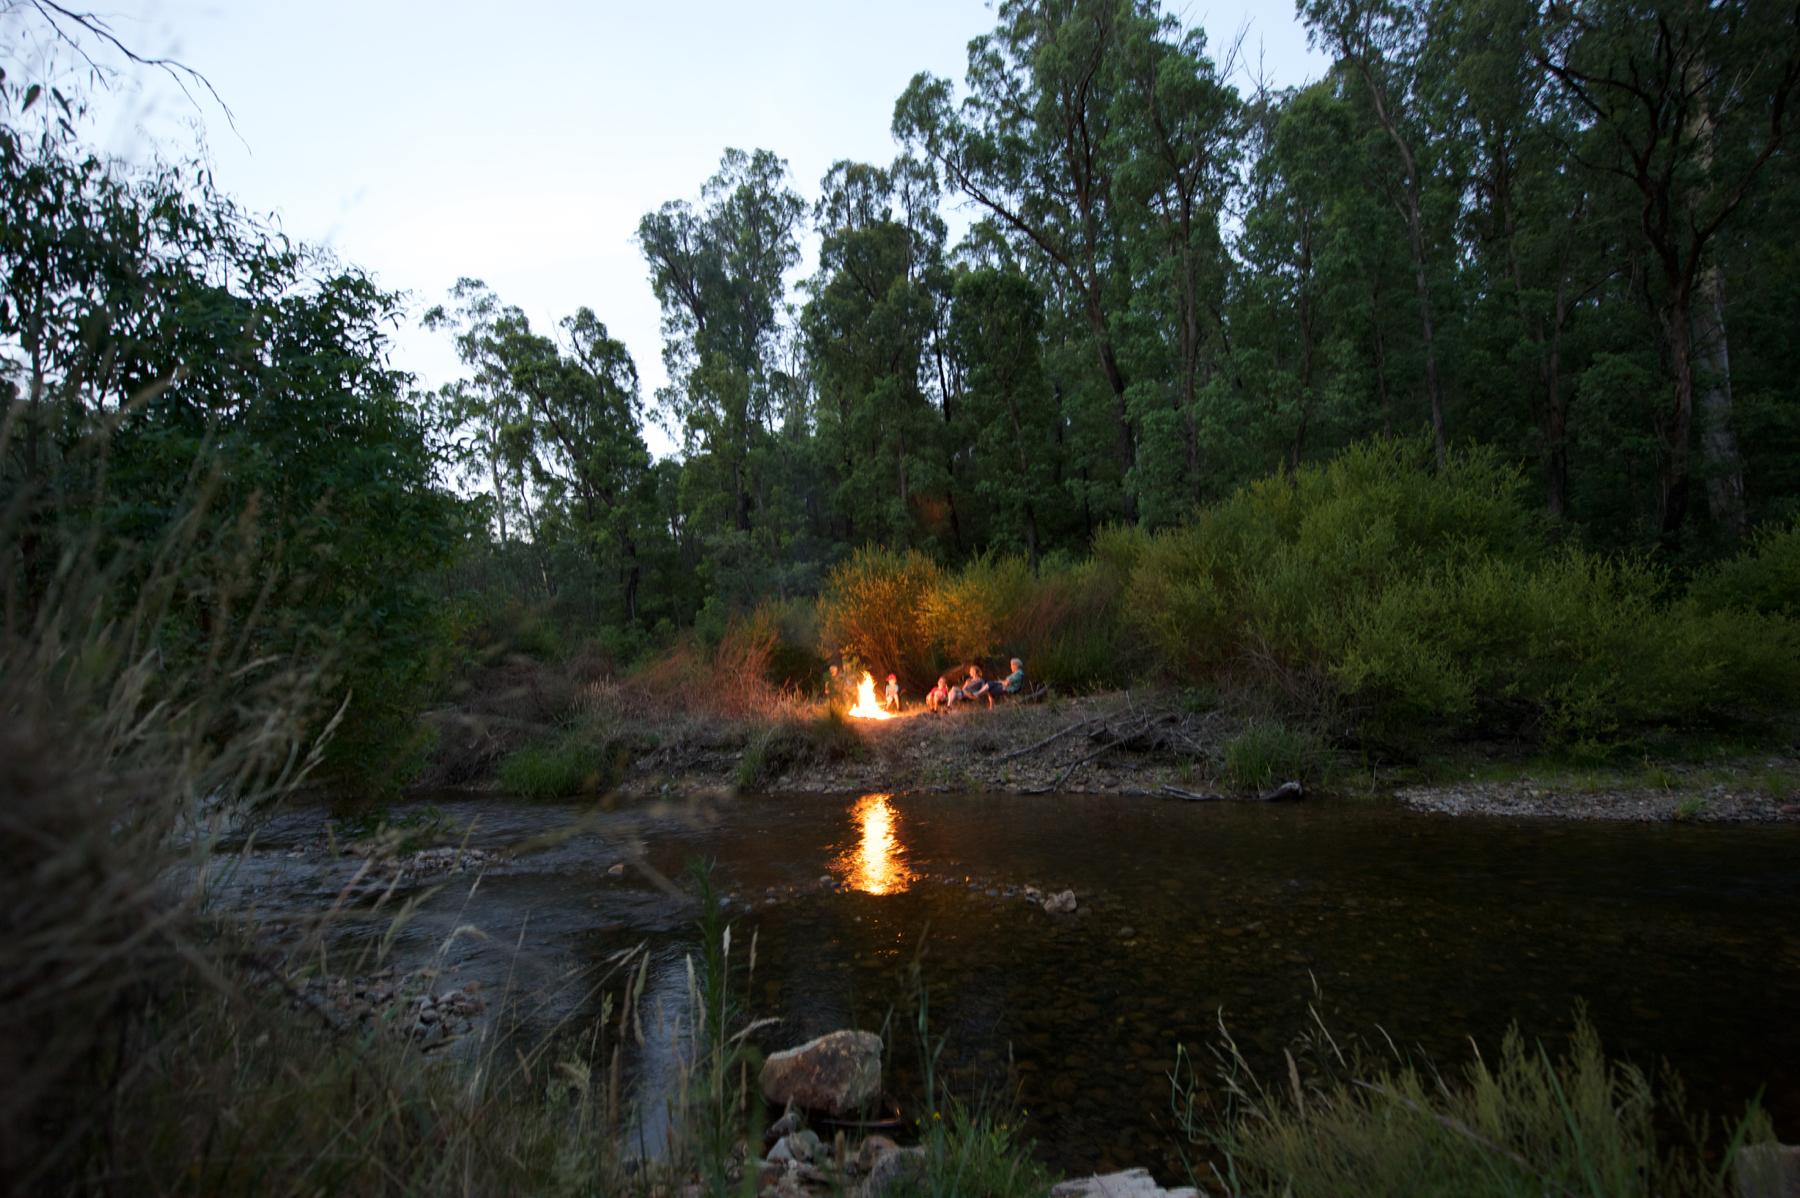 camp fire, river, island, kids, camping